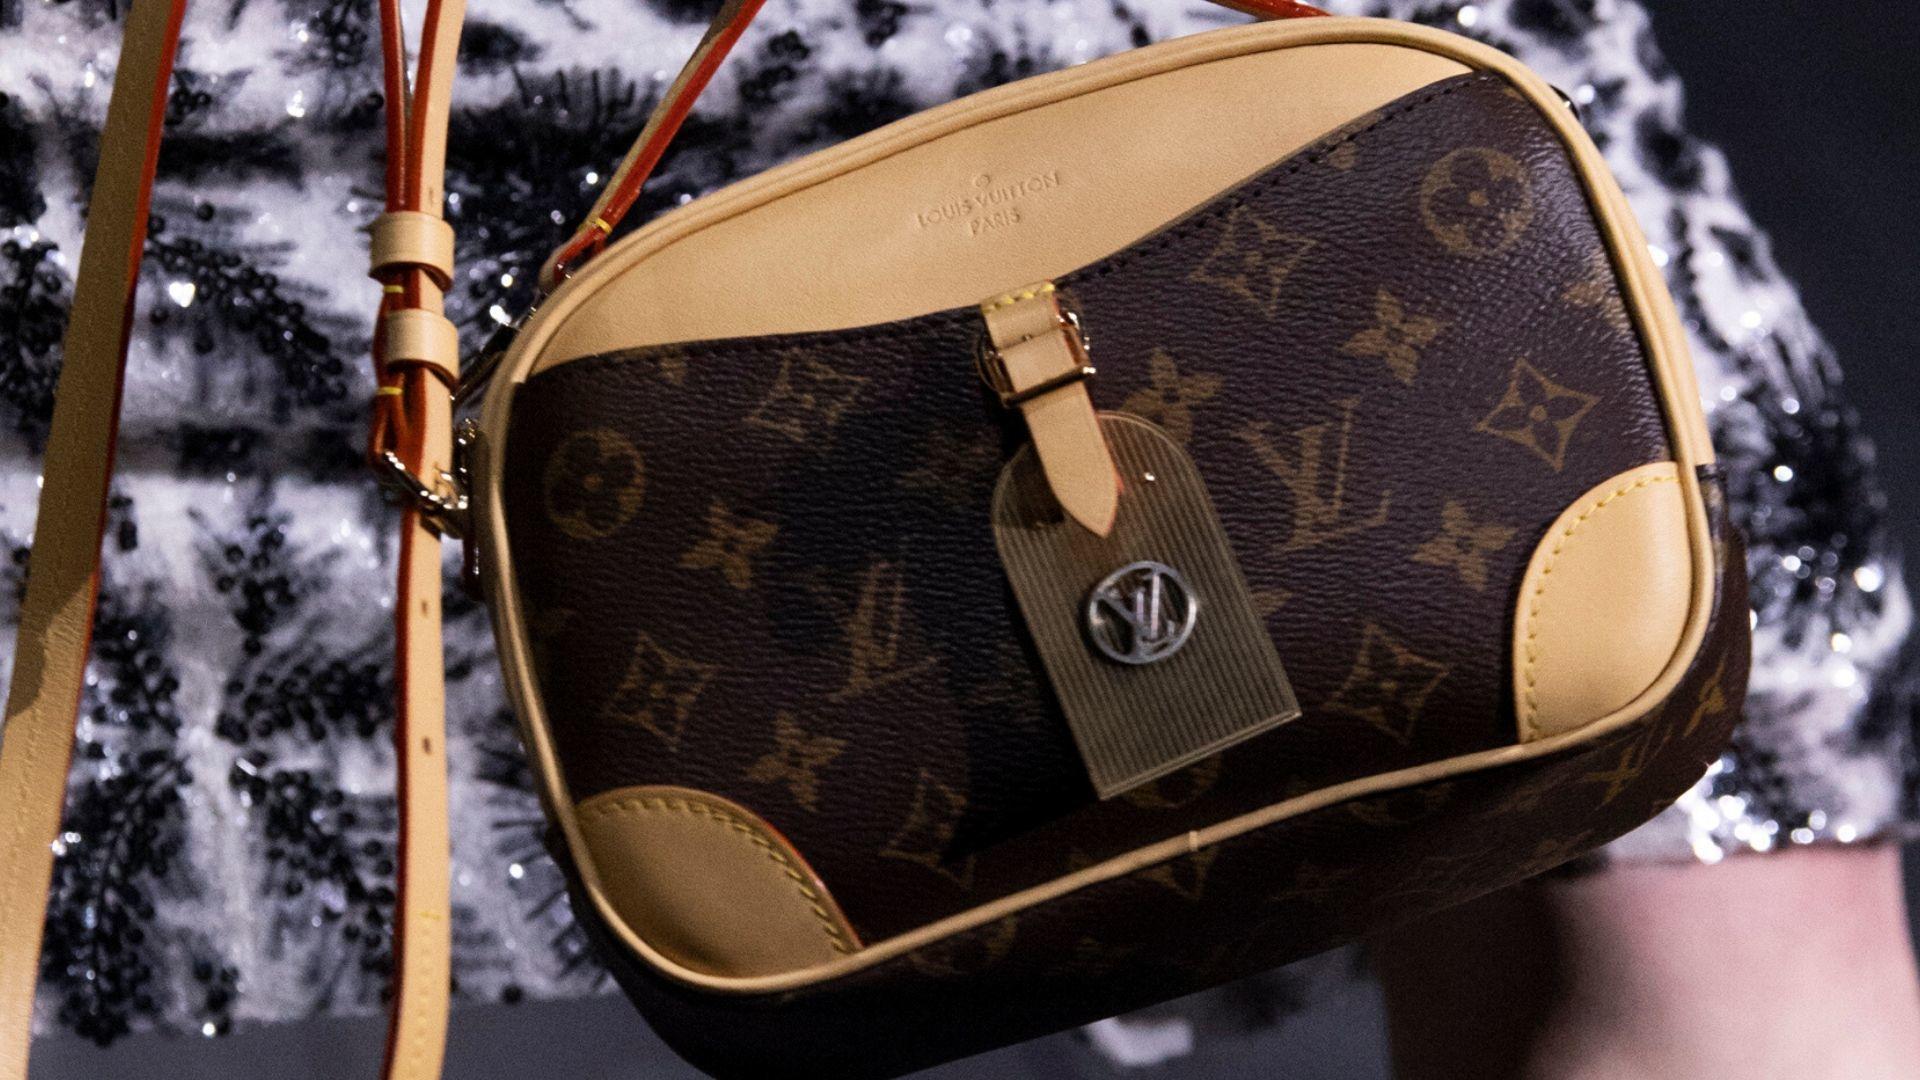 Louis Vuitton Launches E-Commerce Platform In The UAE